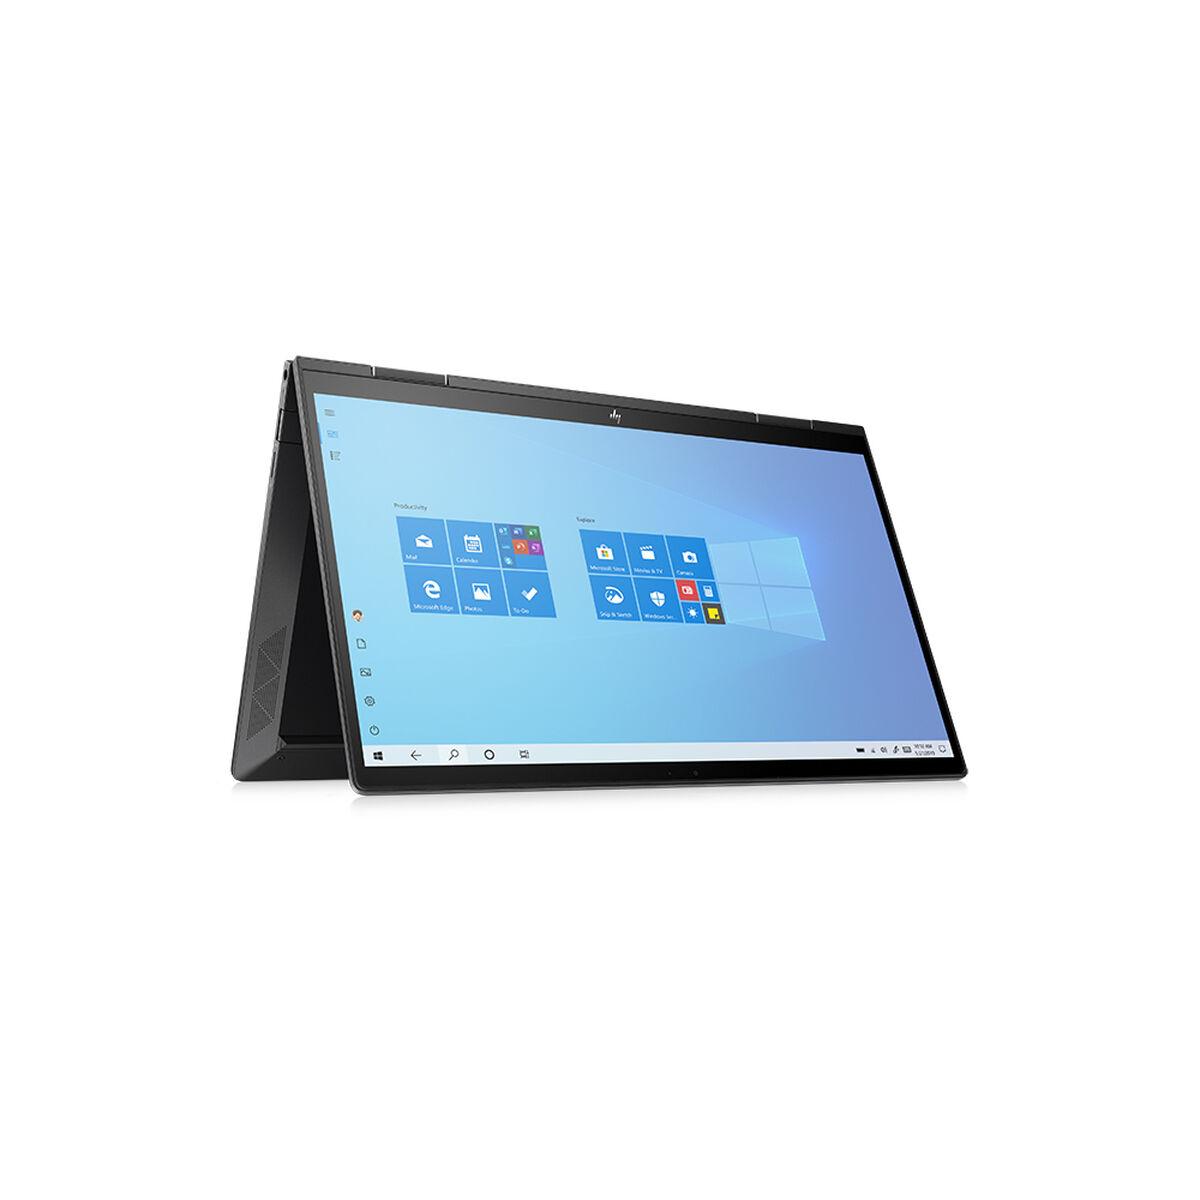 "Notebook HP 13-ay0102 Ryzen 5 8GB 256GB SSD 13.3"" Touch"